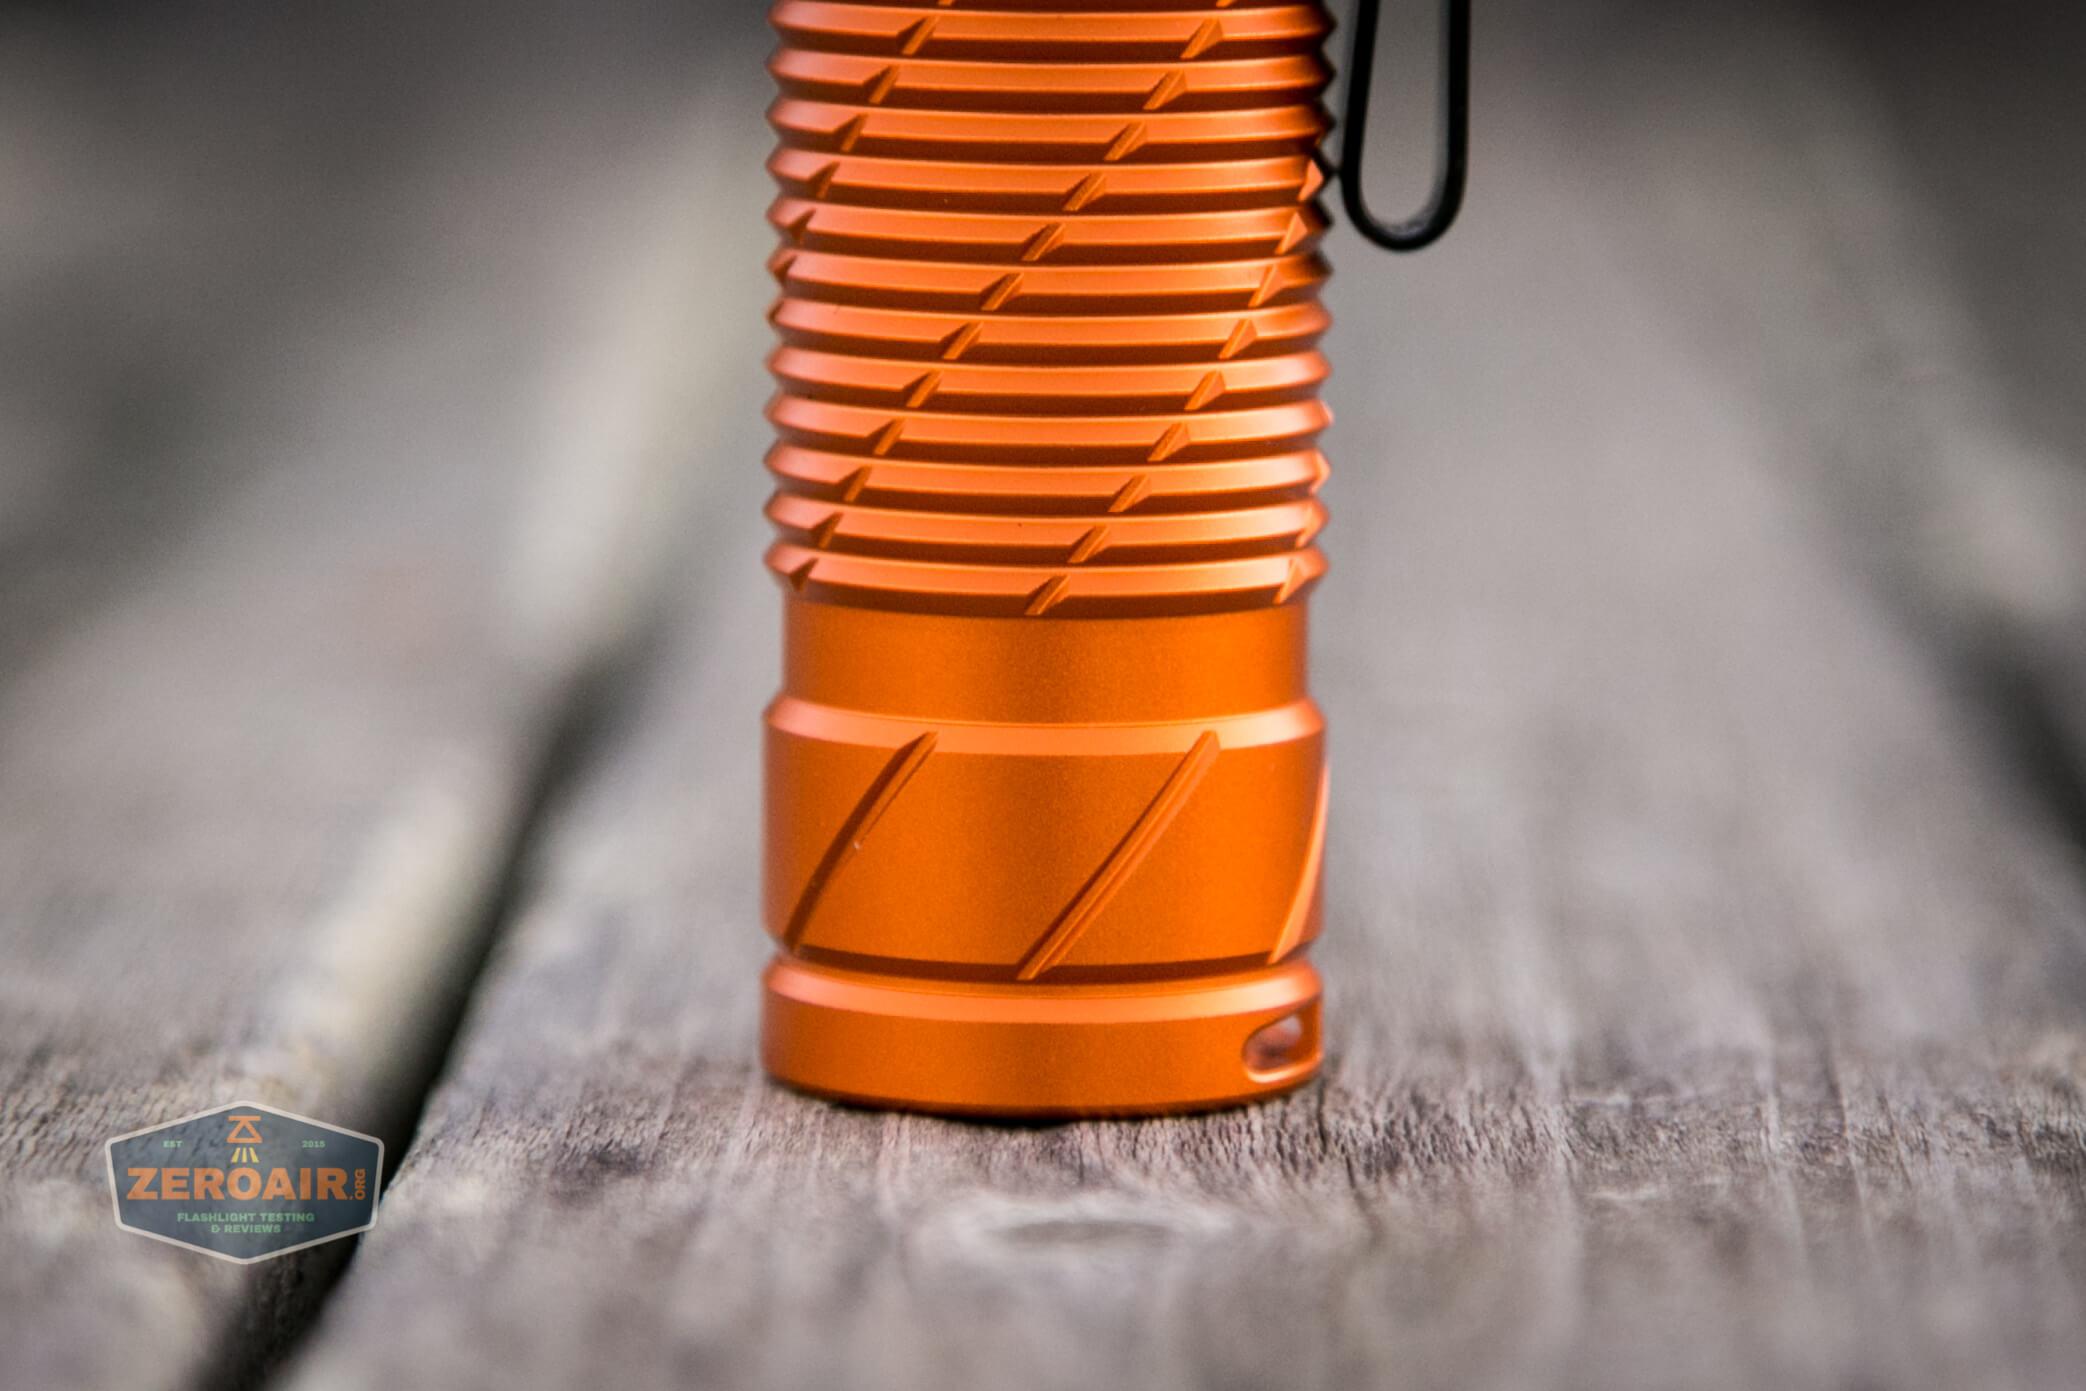 olight perun 2 21700 headlamp orange tailcap